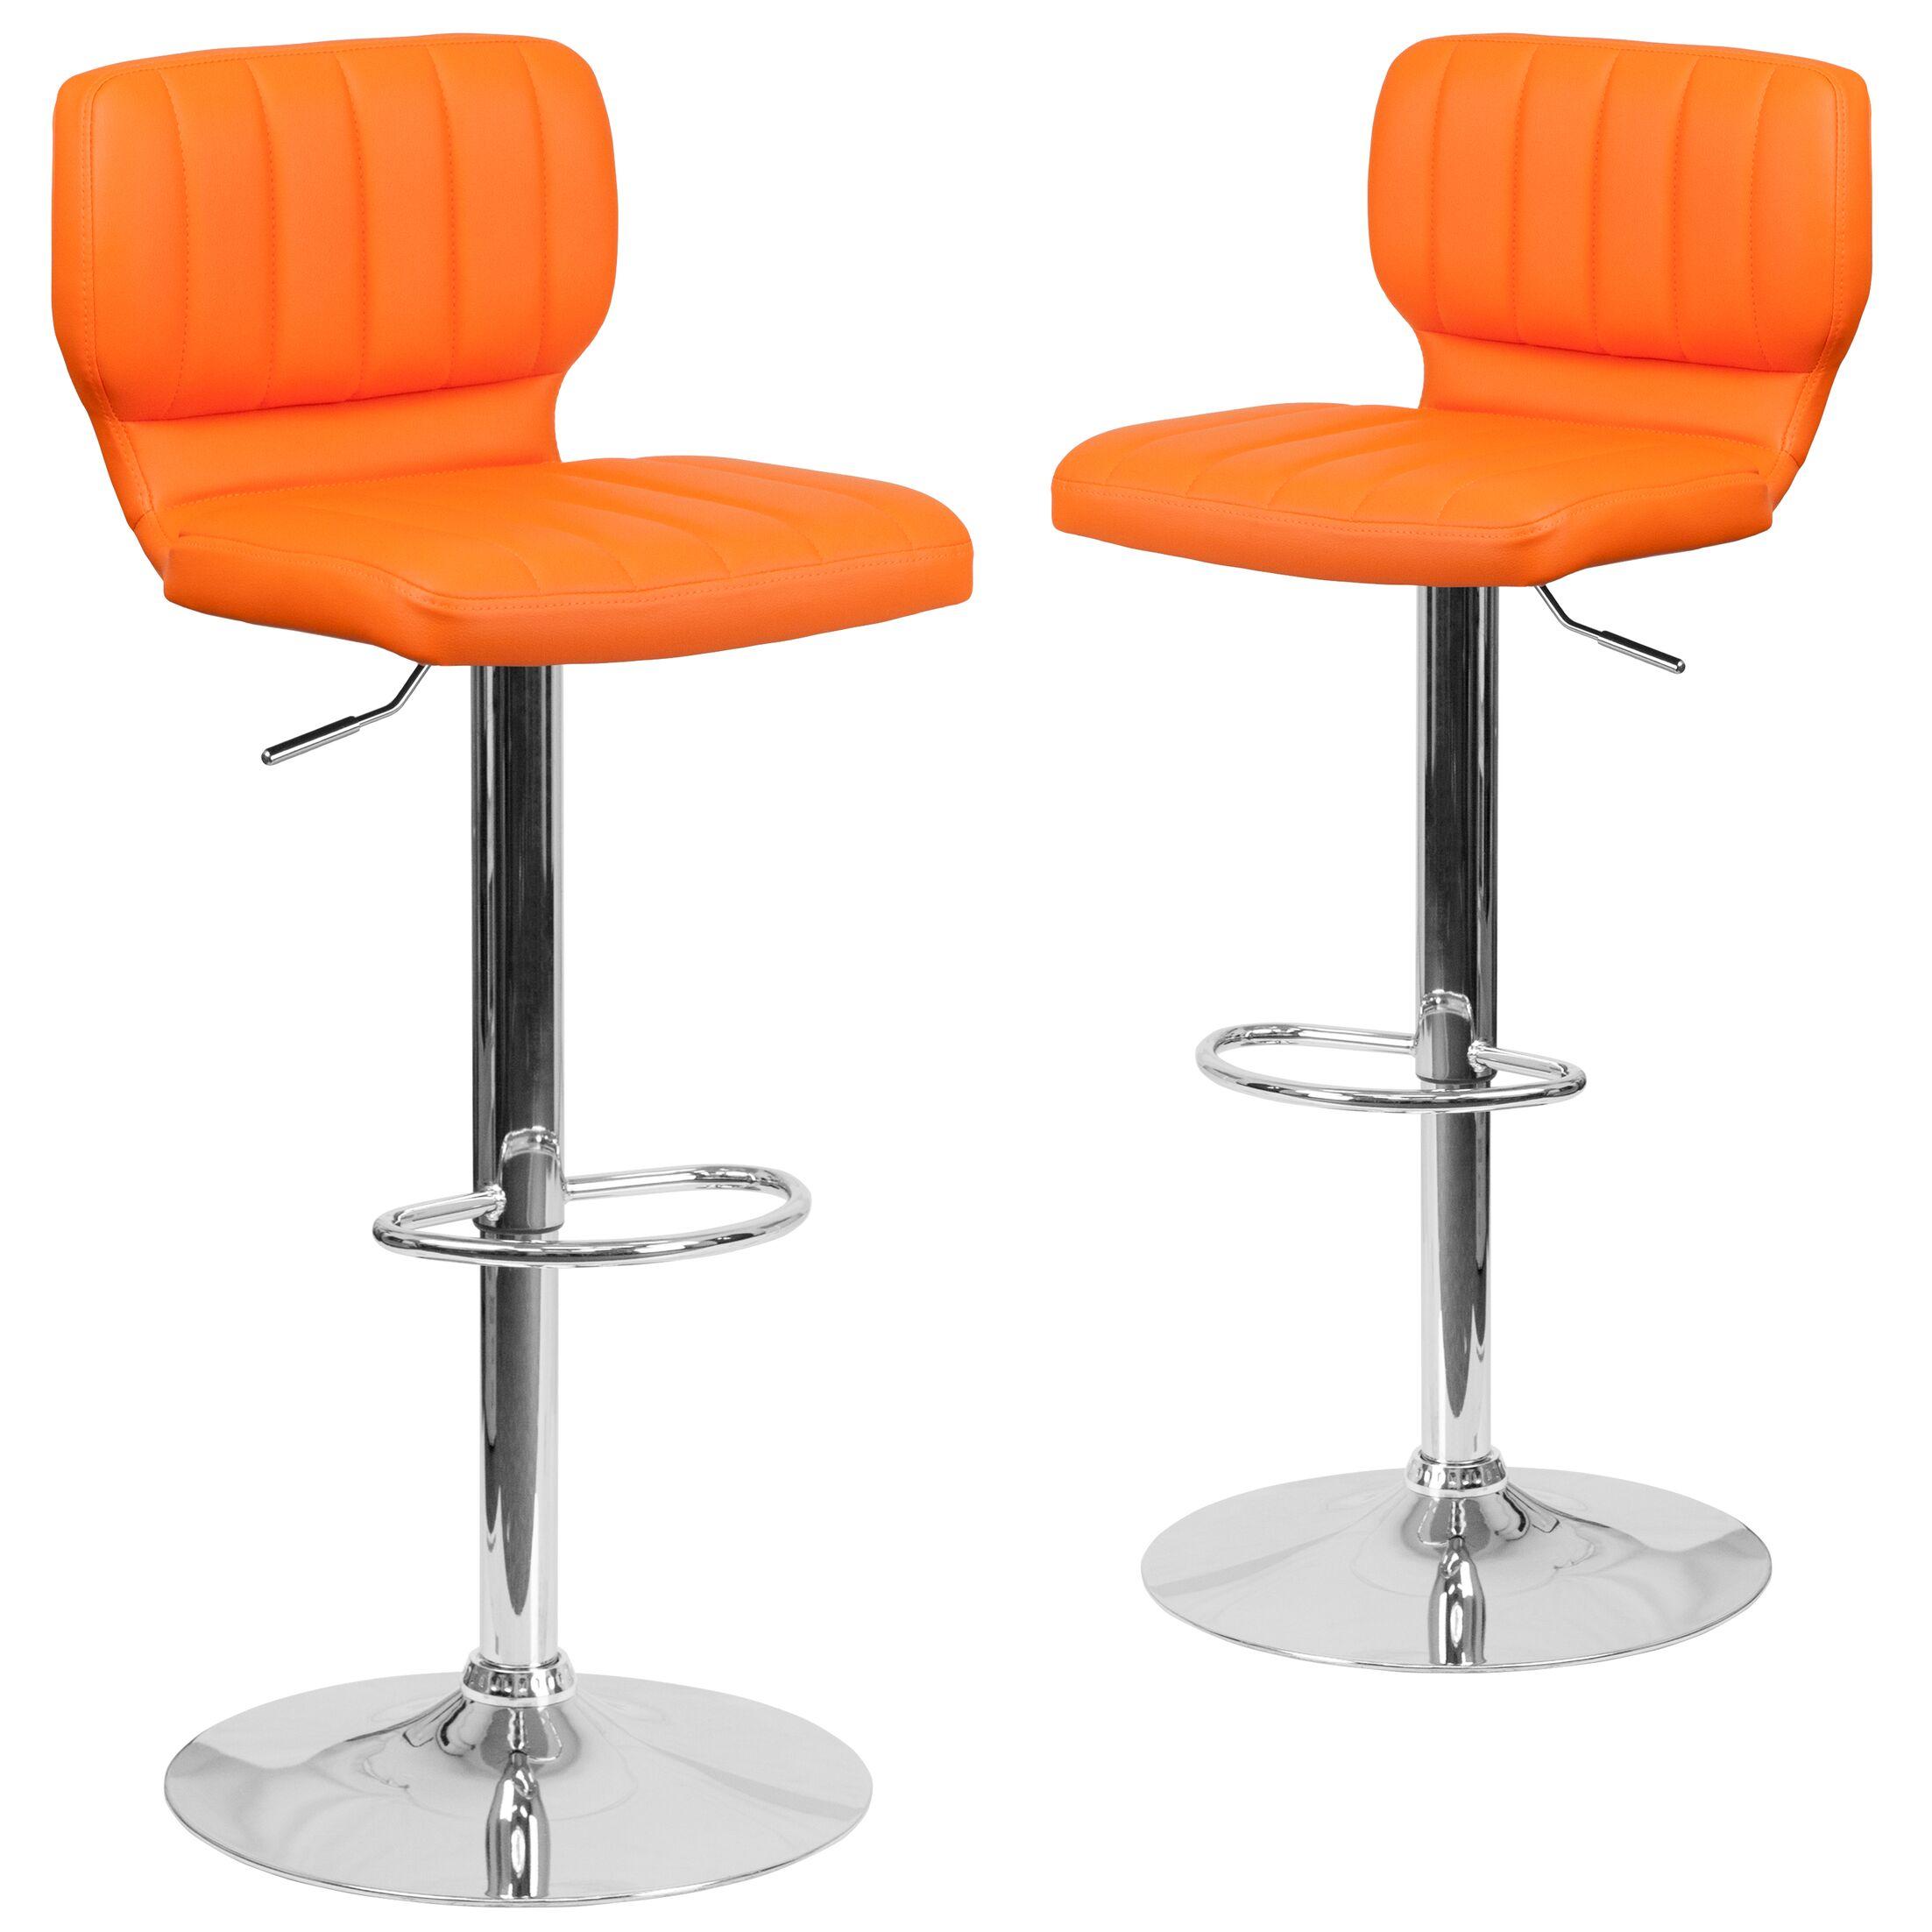 Norrell Adjustable Swivel Bar Stool Upholstery: Orange